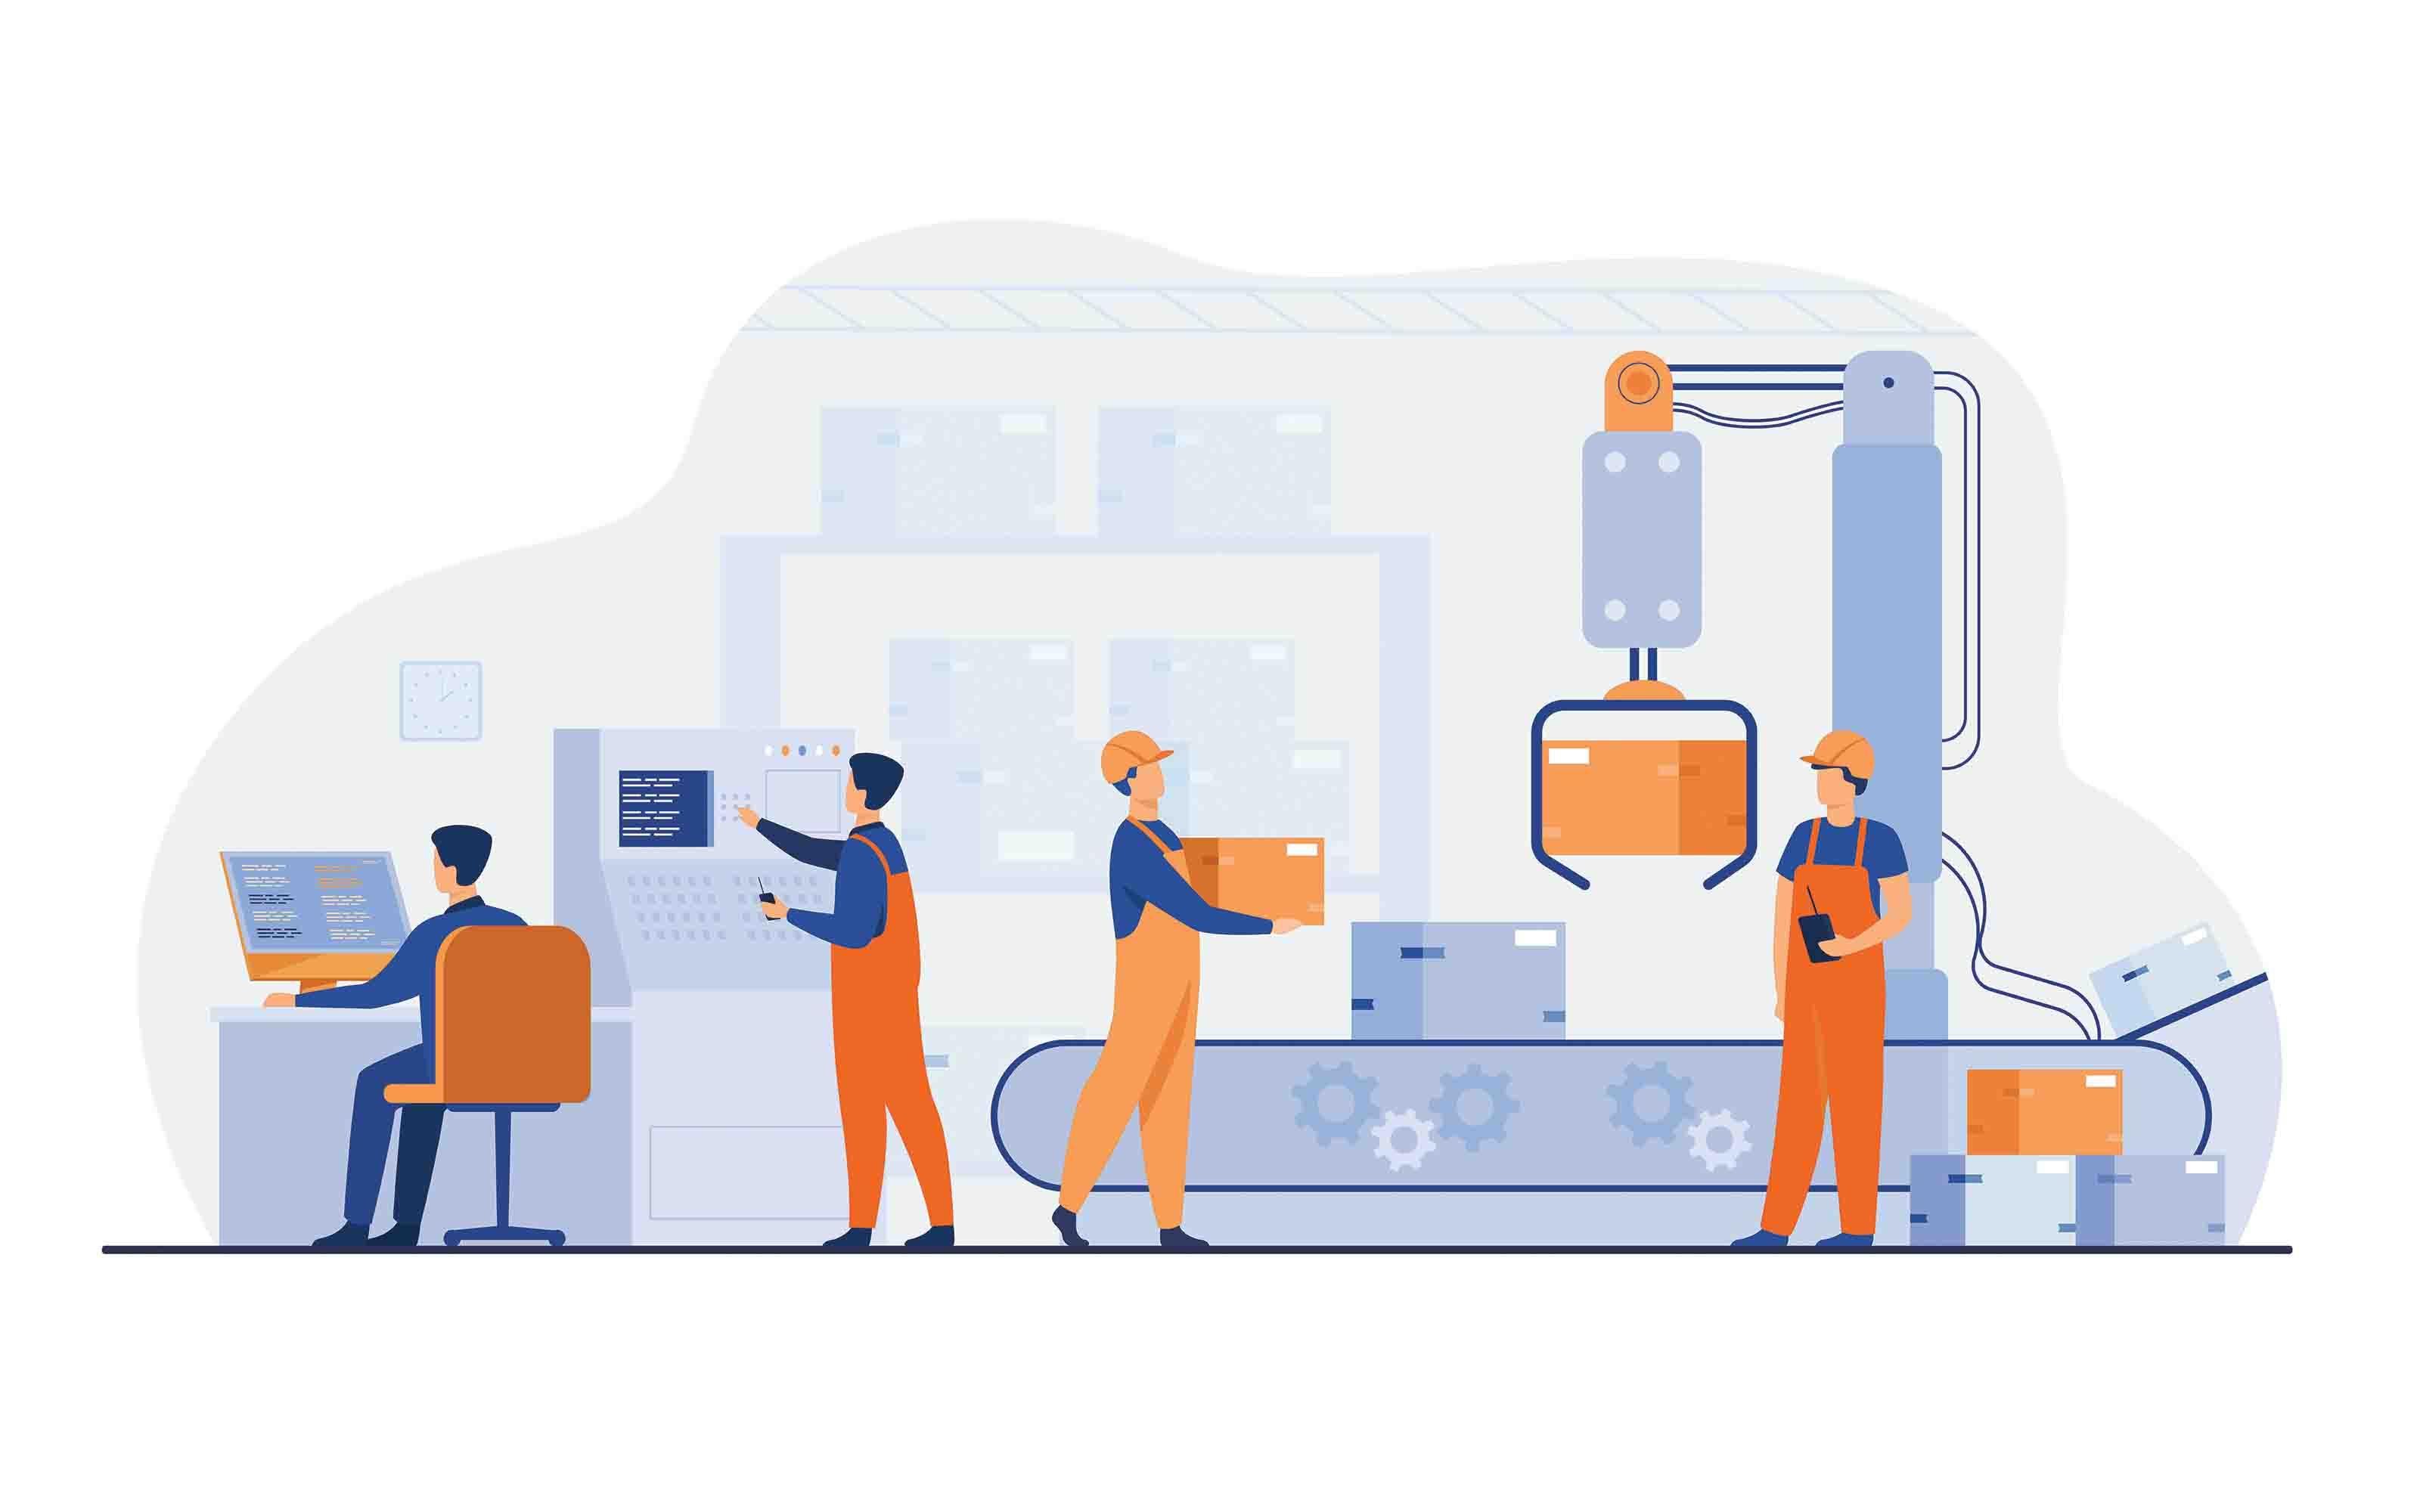 Zapoj CEM Helps Leverage the Manufacturing process